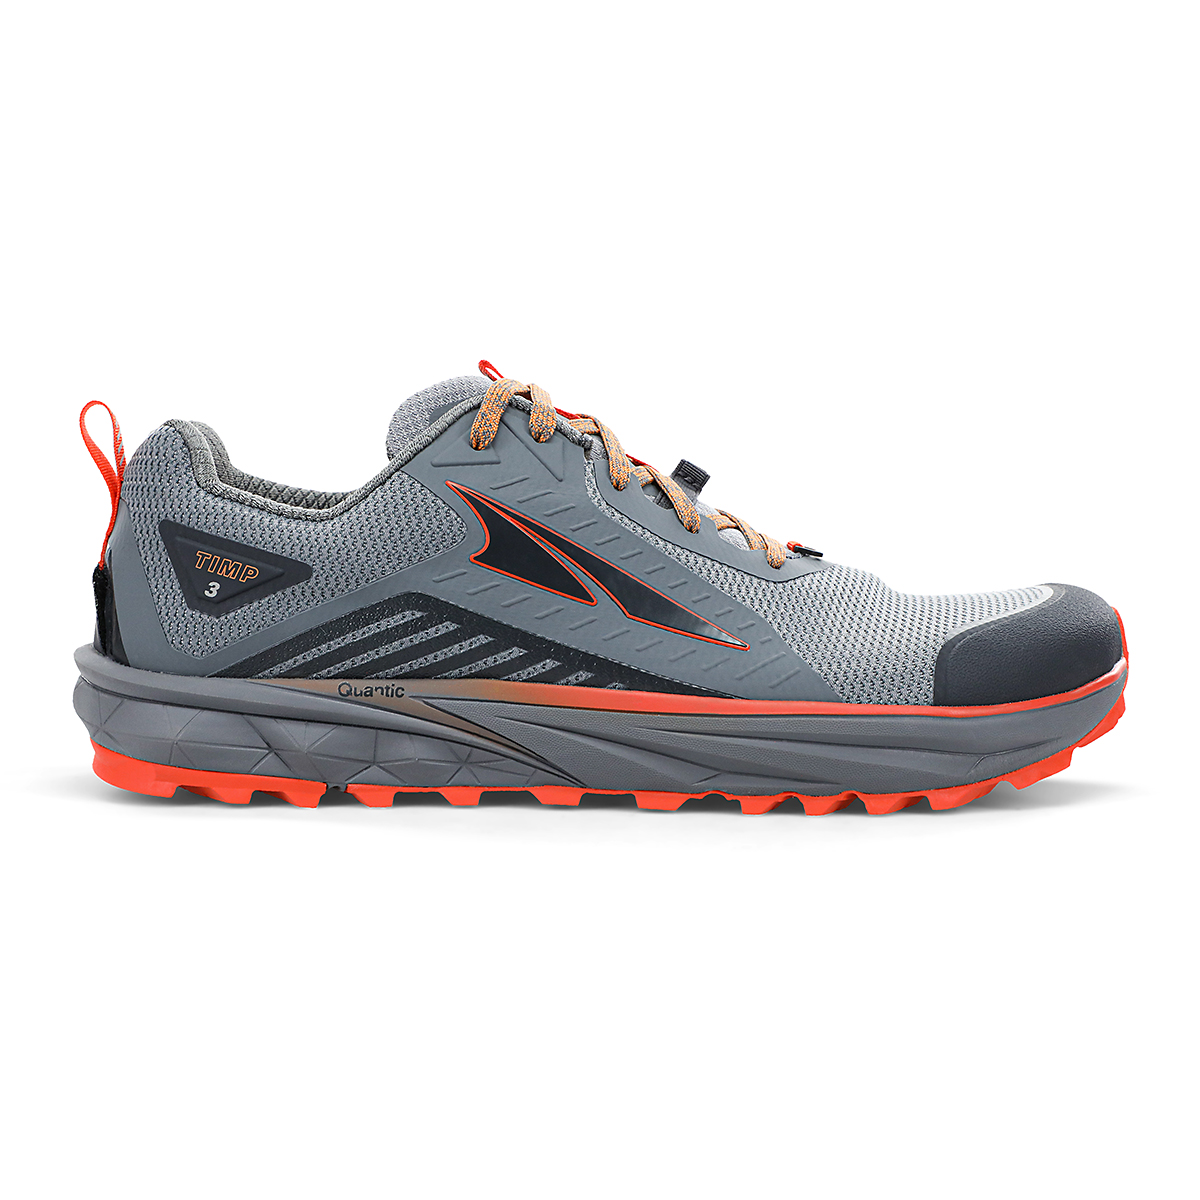 Men's Altra Timp 3 Trail Running Shoe - Color: Gray/Orange - Size: 7 - Width: Regular, Gray/Orange, large, image 1